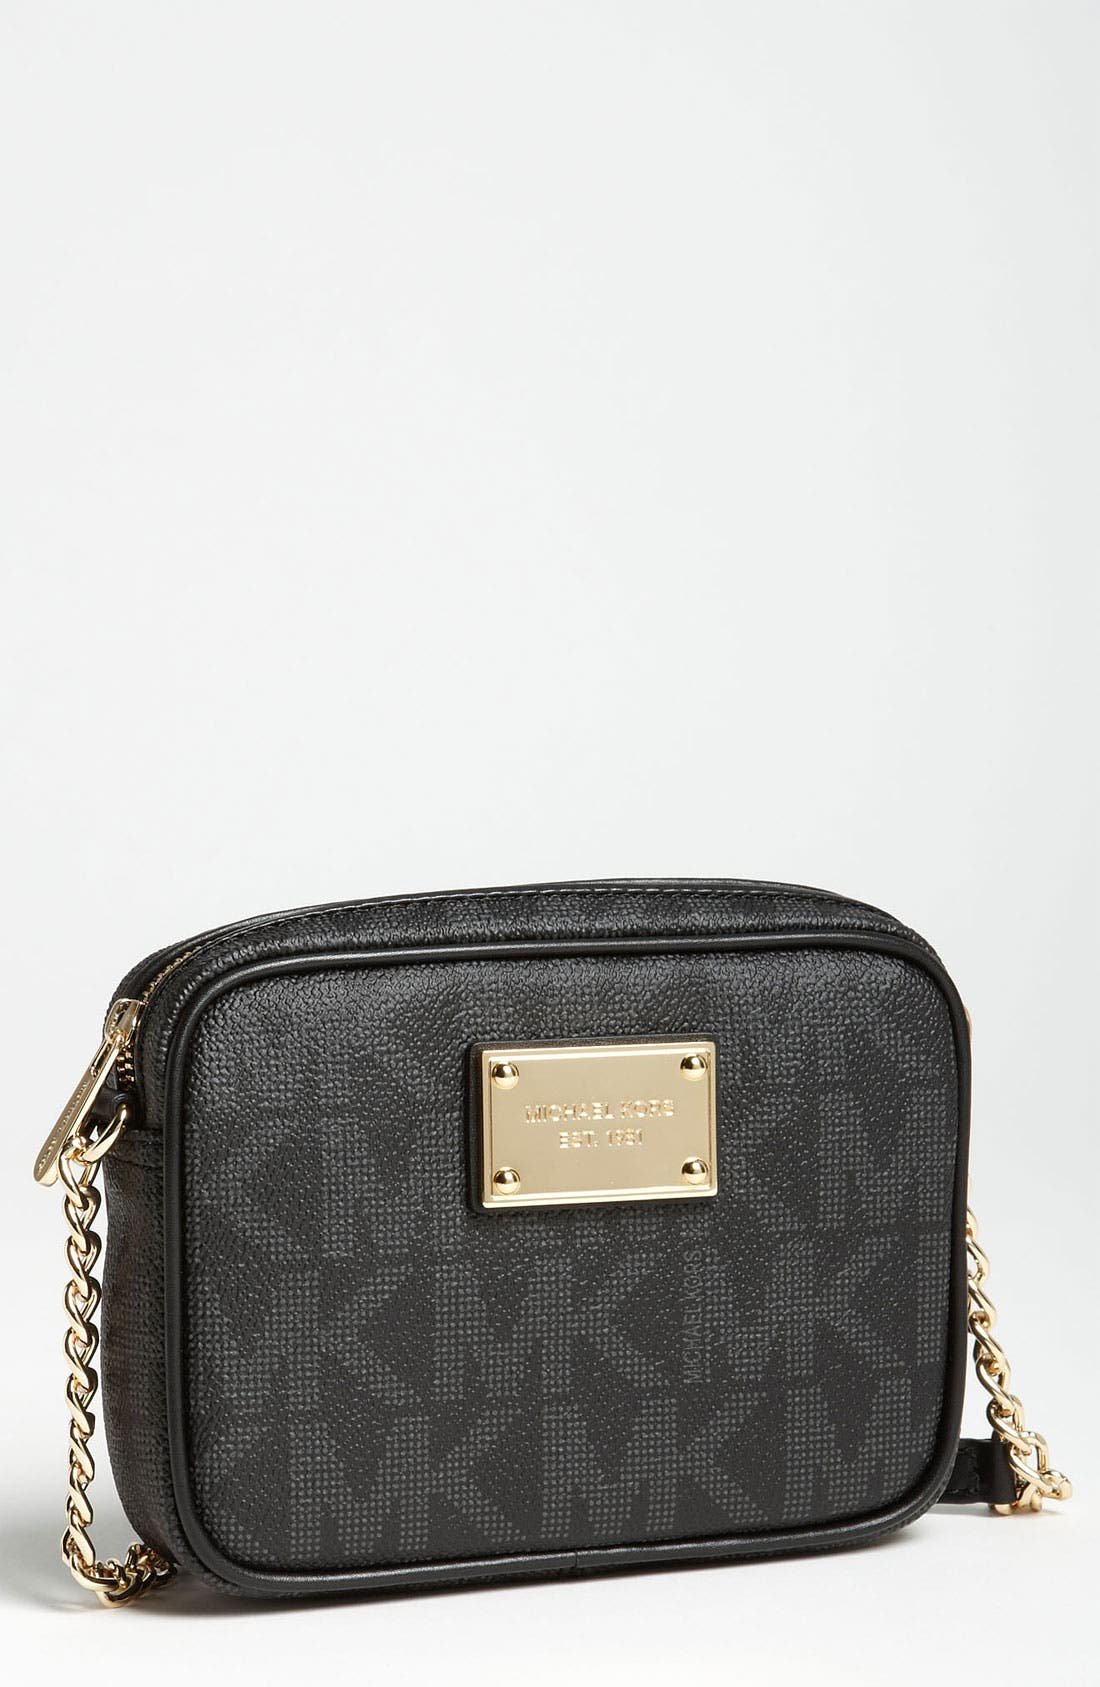 Alternate Image 1 Selected - MICHAEL Michael Kors 'Small' Crossbody Bag